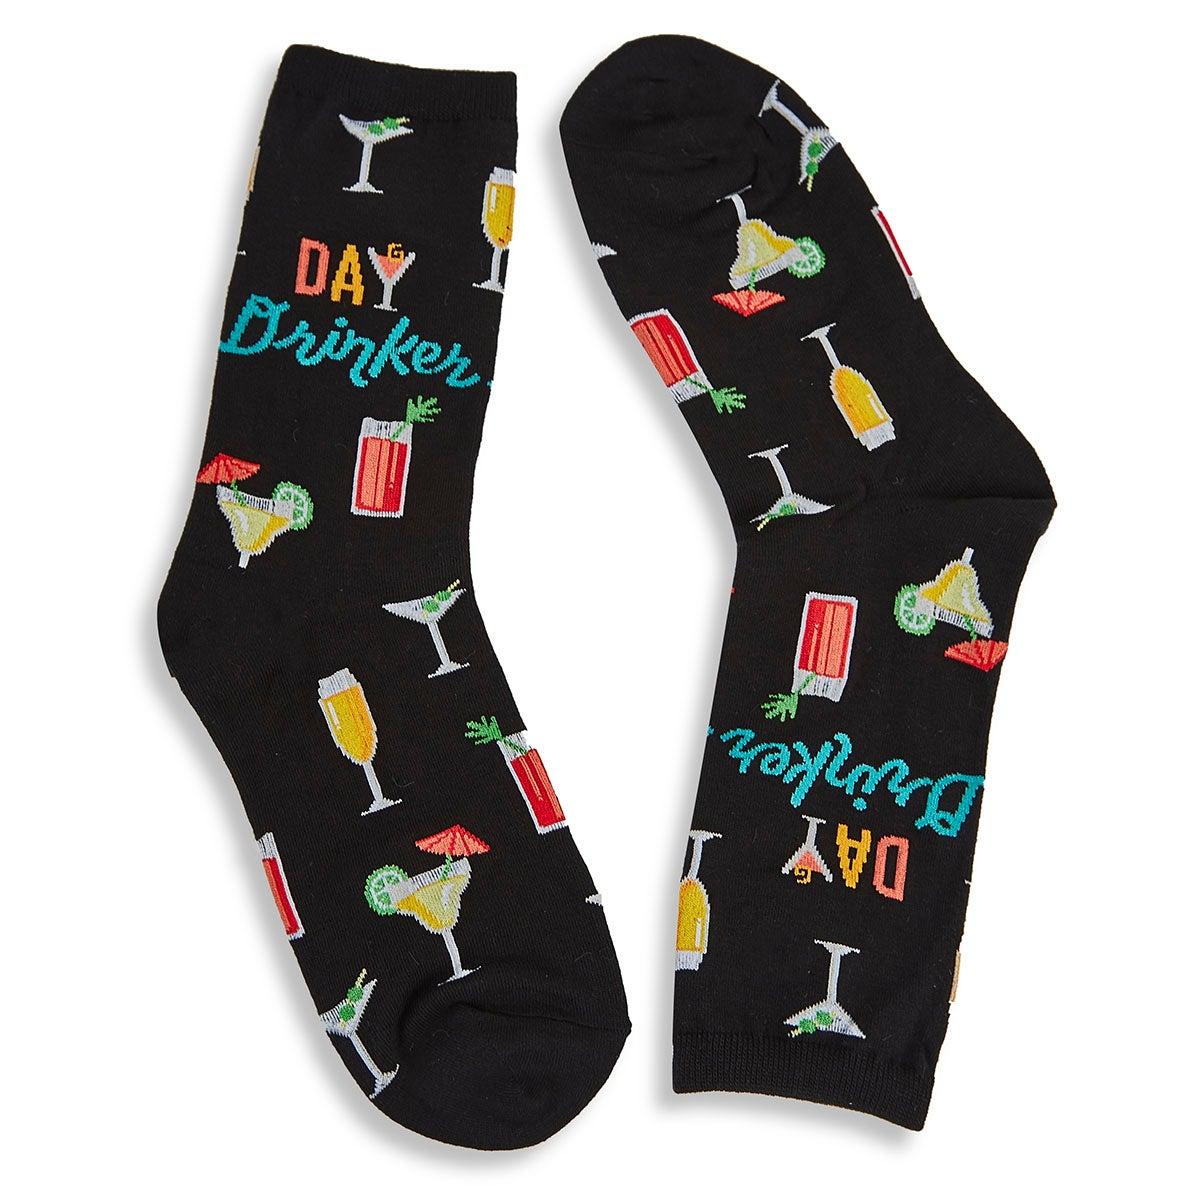 Women's Day Drinker Sock - Black Printed